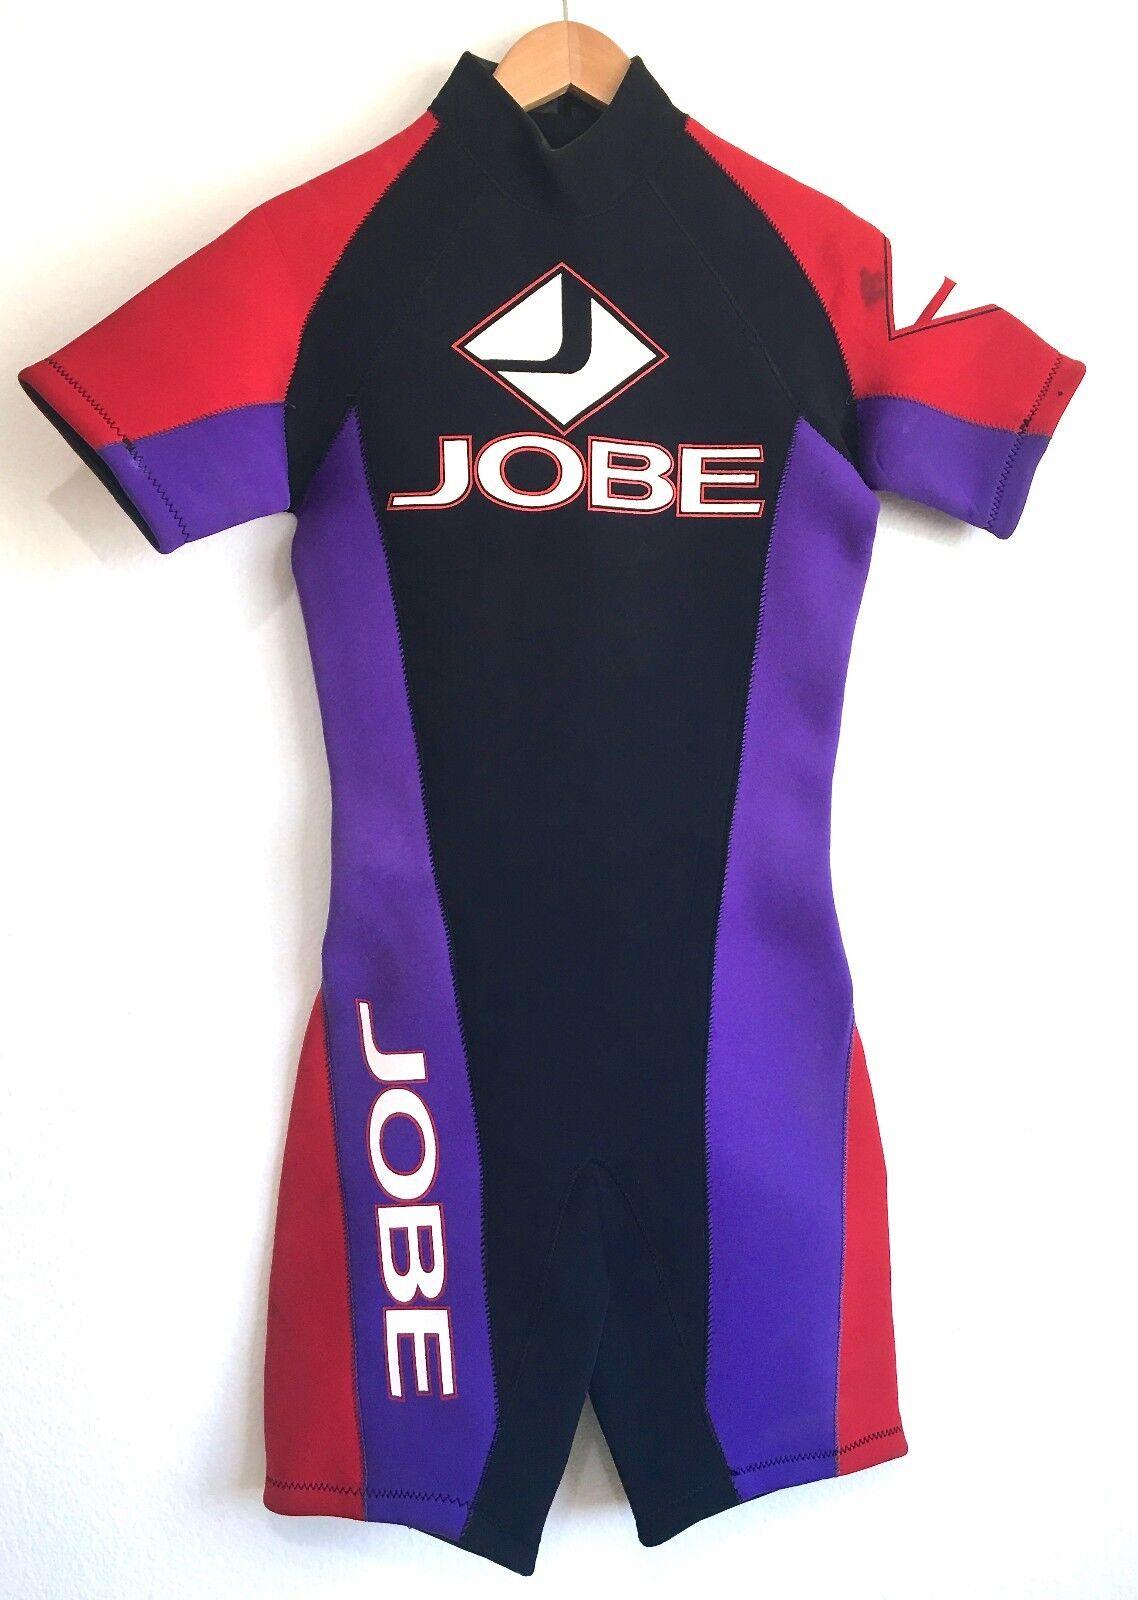 767683b2491 Jobe Mens Shorty Wetsuit Size Small S Spring noocbc1087-Men